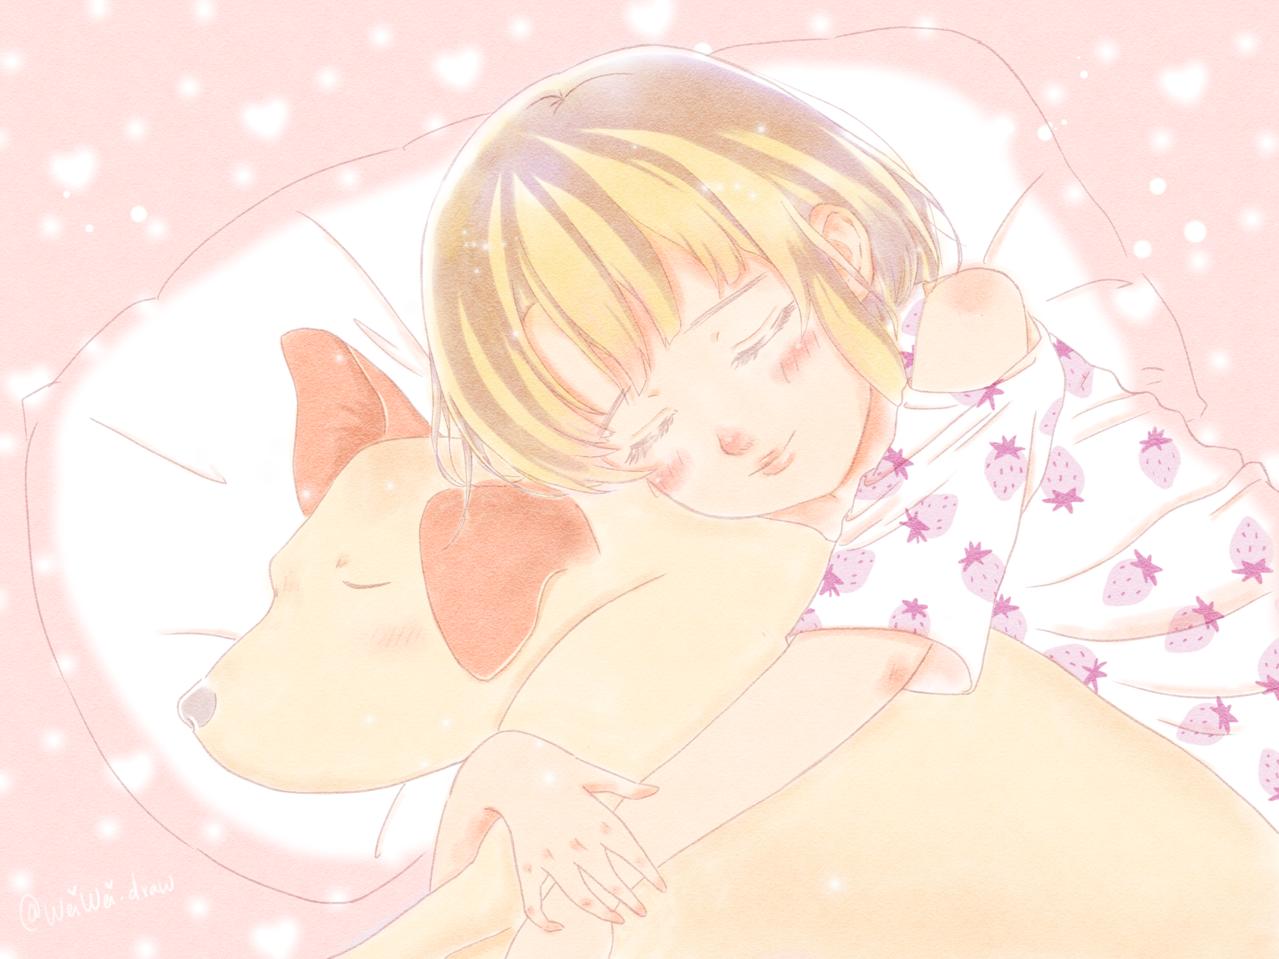 Sweet Dreams Illust of Wei Wei.draw DOGvsCAT_DOG kawaii girl Inu dog Doglover